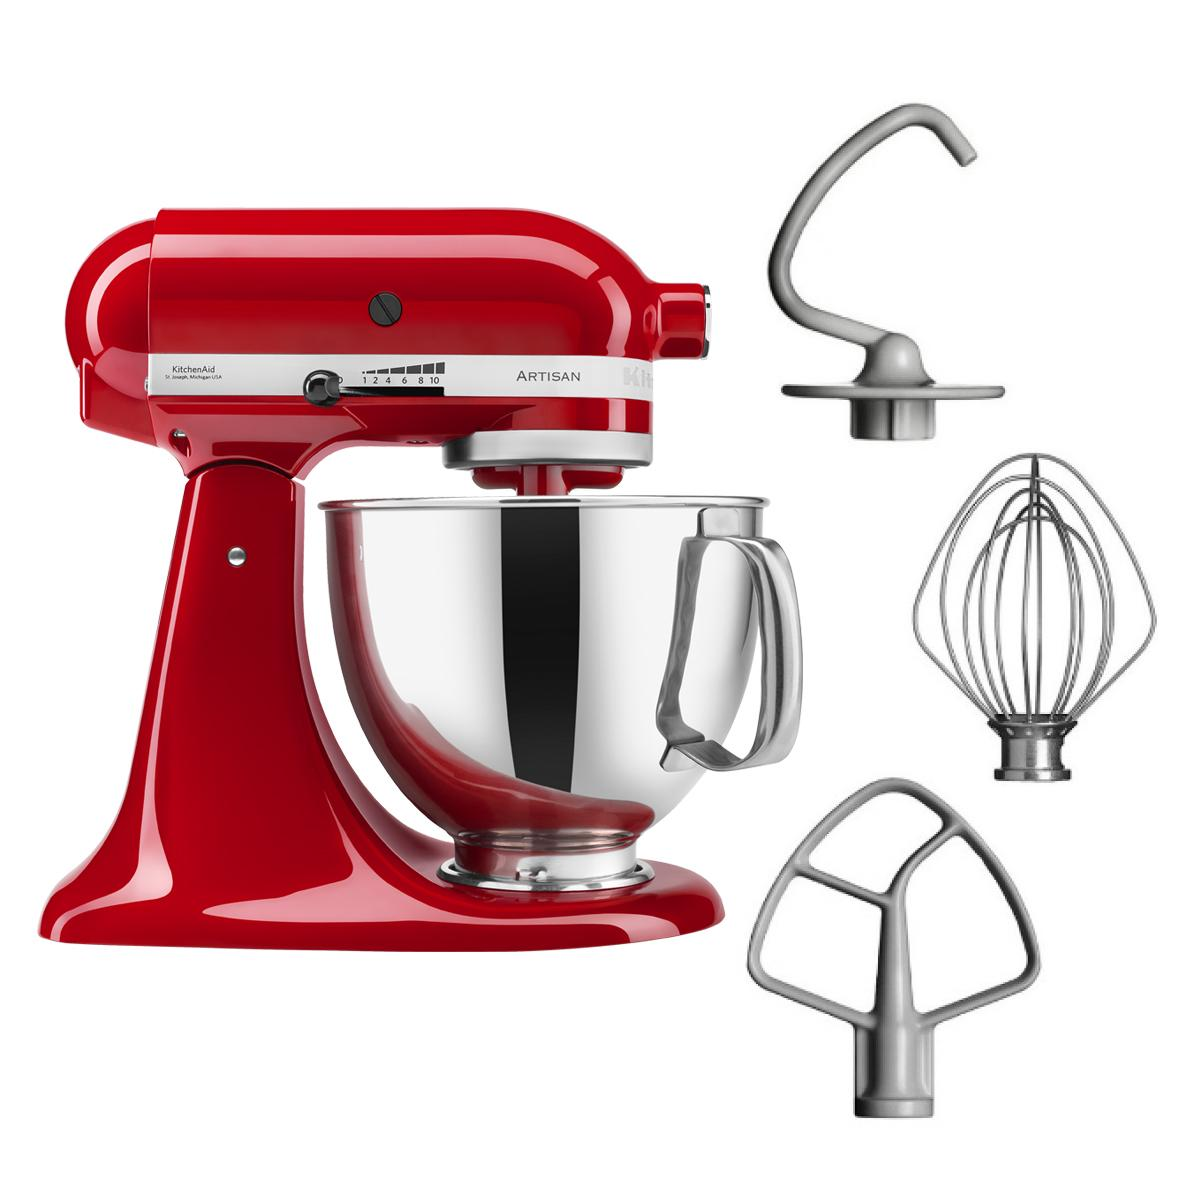 Latest Kitchenaid Mixers Products Enjoy Huge Discounts Lazada Sg